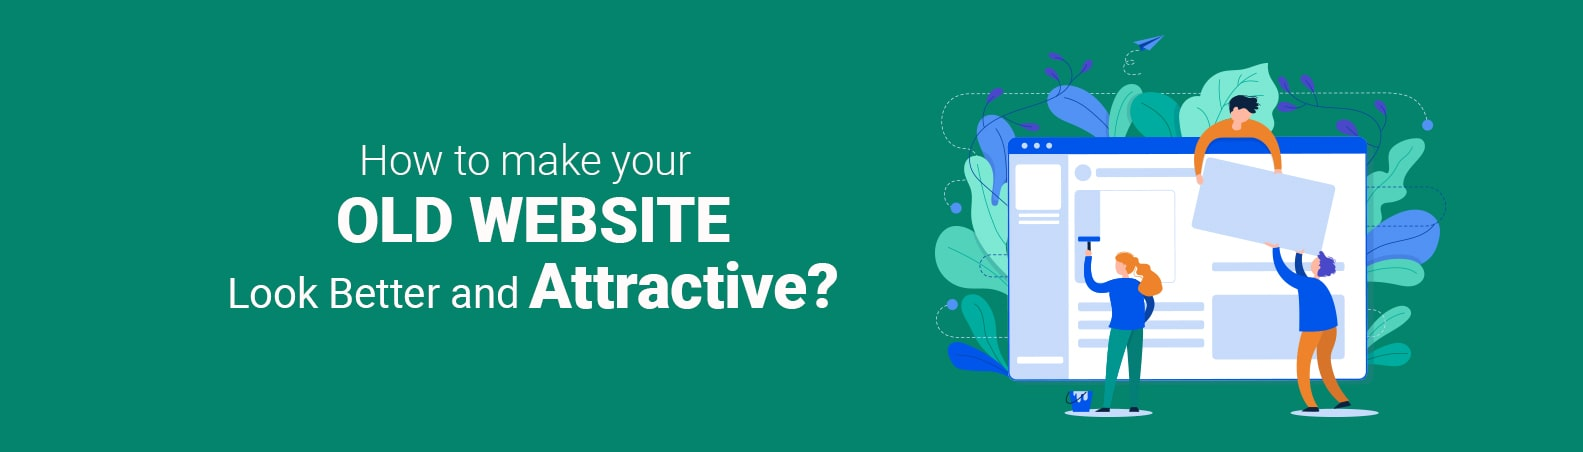 Top 10 Methods to Make a Website Attractive-min